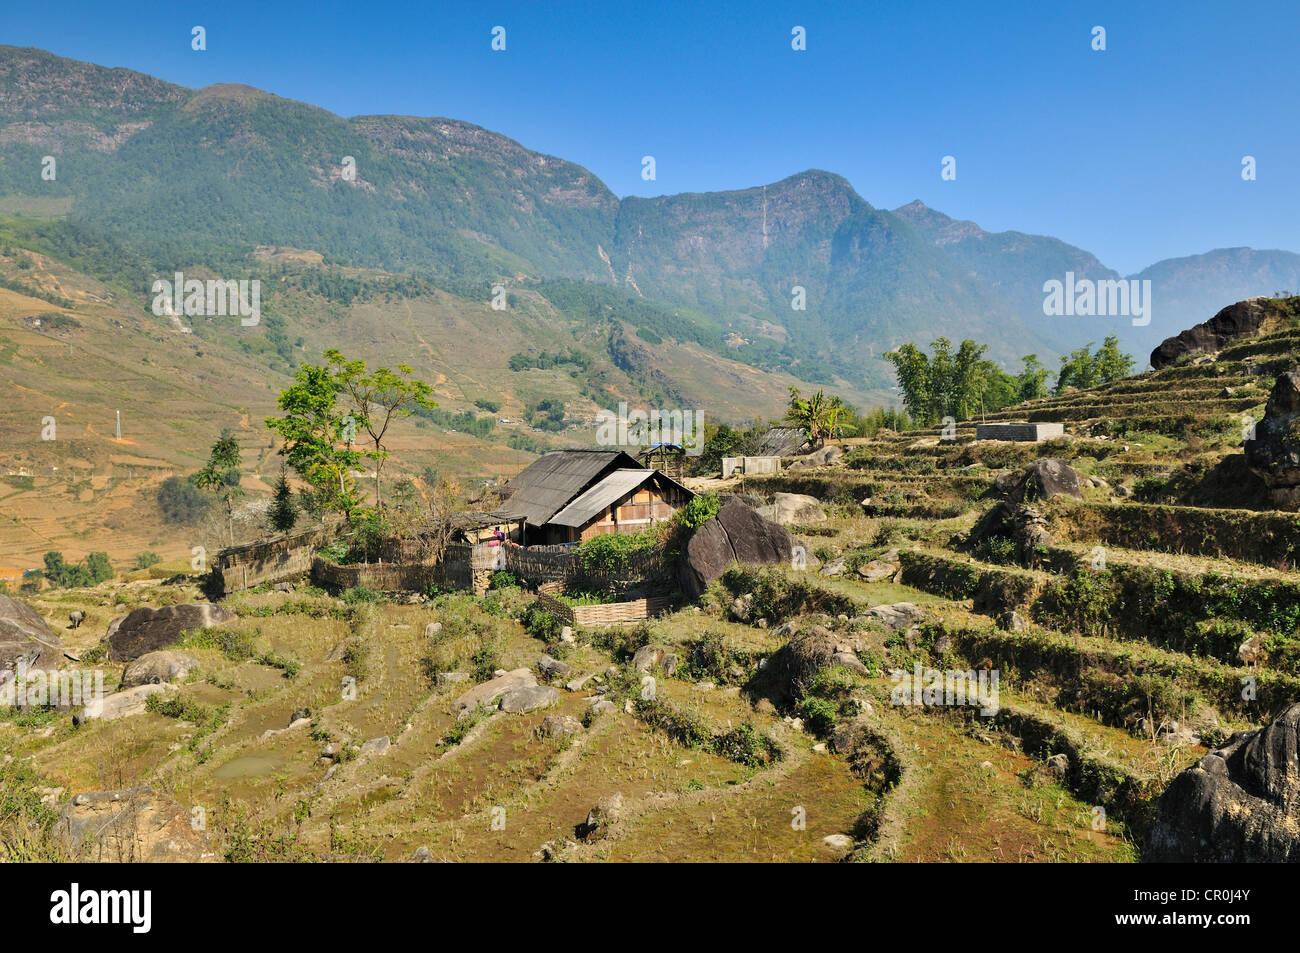 Houses, rice farmers, rice terraces, rice paddies near Sapa, Sa Pa, Lao Cai province, northern Vietnam, Vietnam, - Stock Image